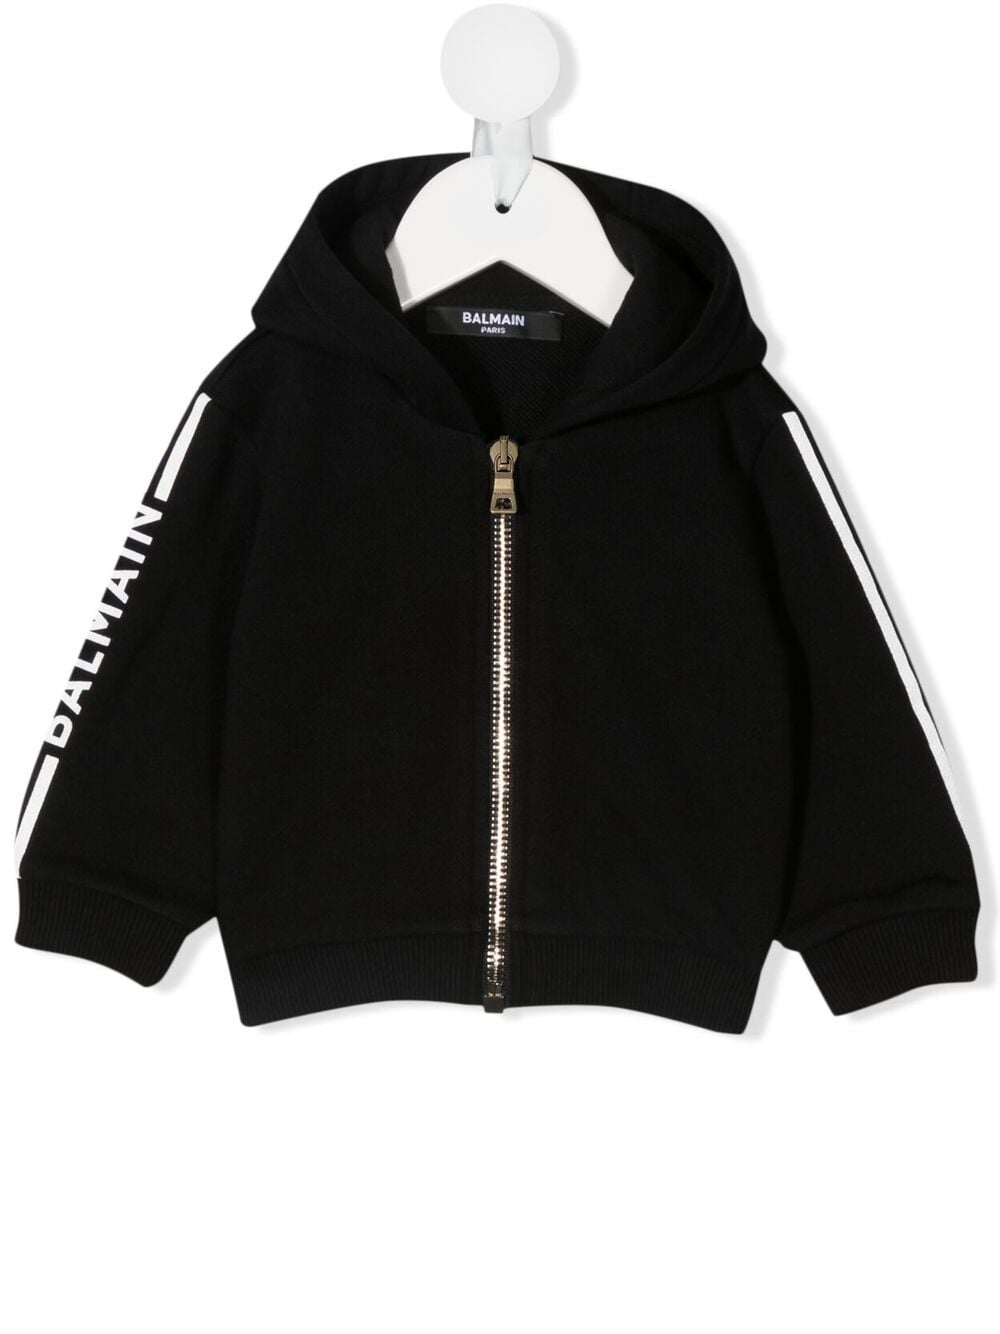 Balmain | Sweatshirt | 6O4A40OX370930BC